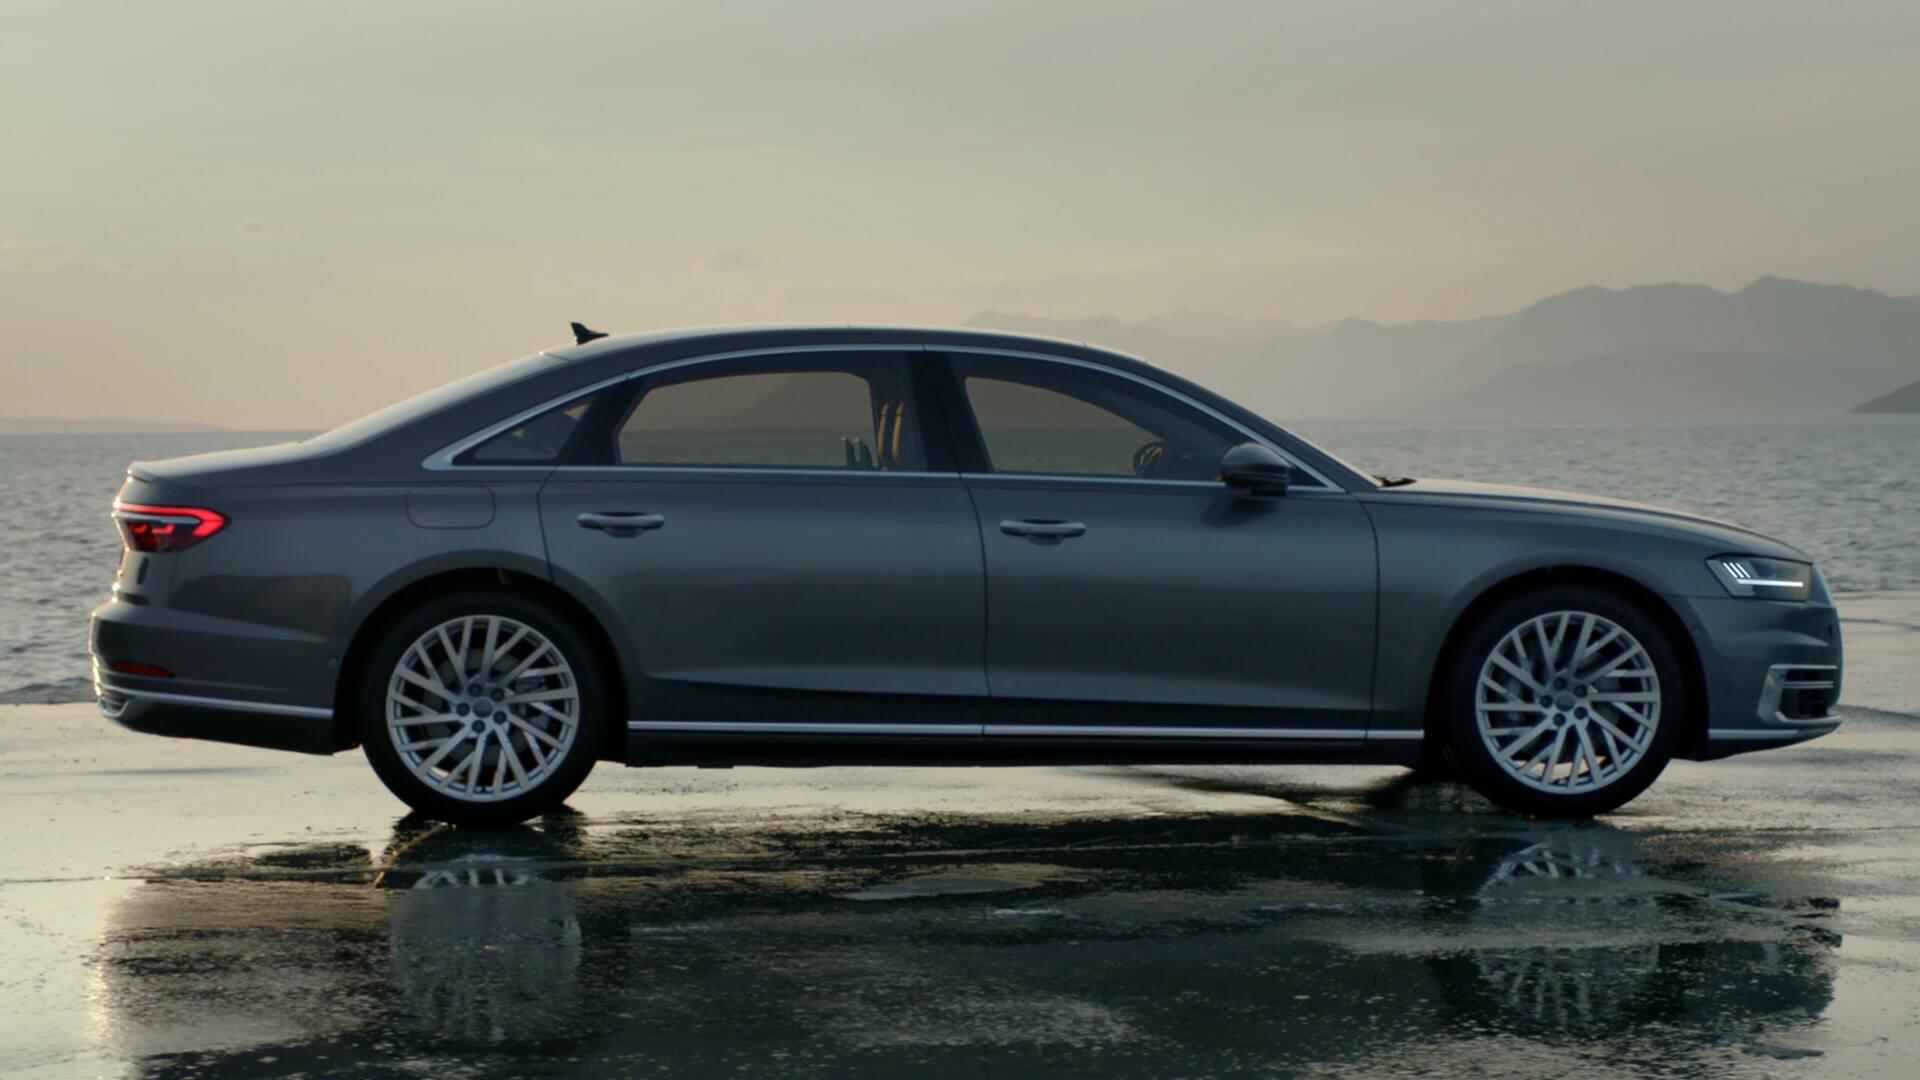 A8 L Gt A8 Gt Audi France